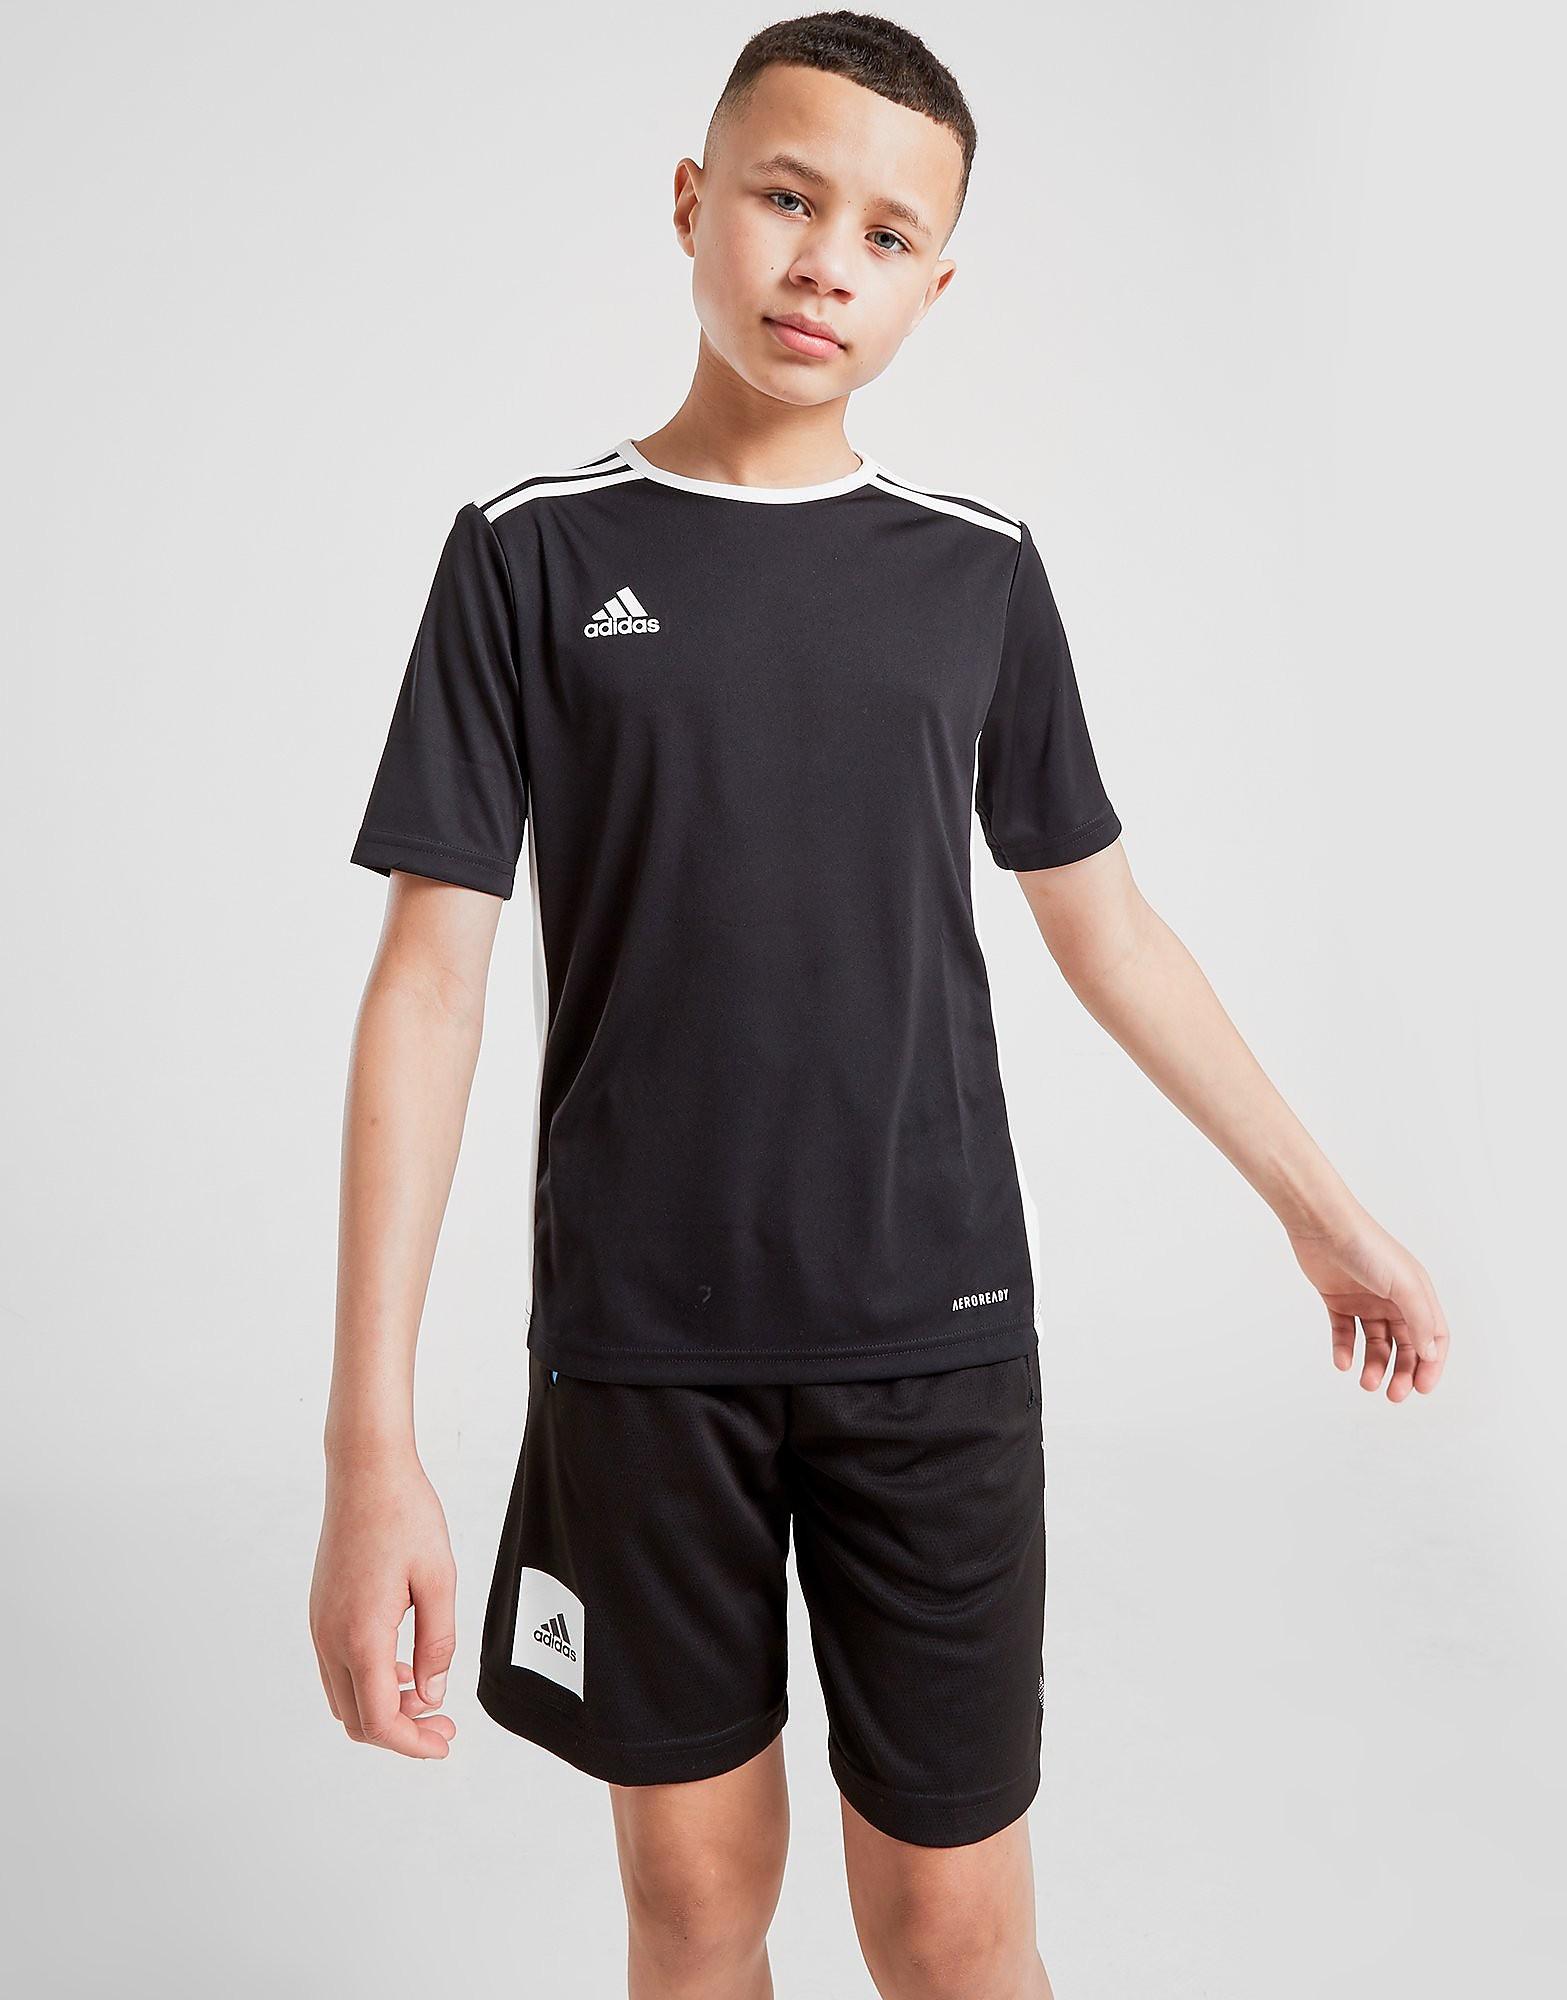 adidas Entrada T-Shirt Junior Zwart Kind